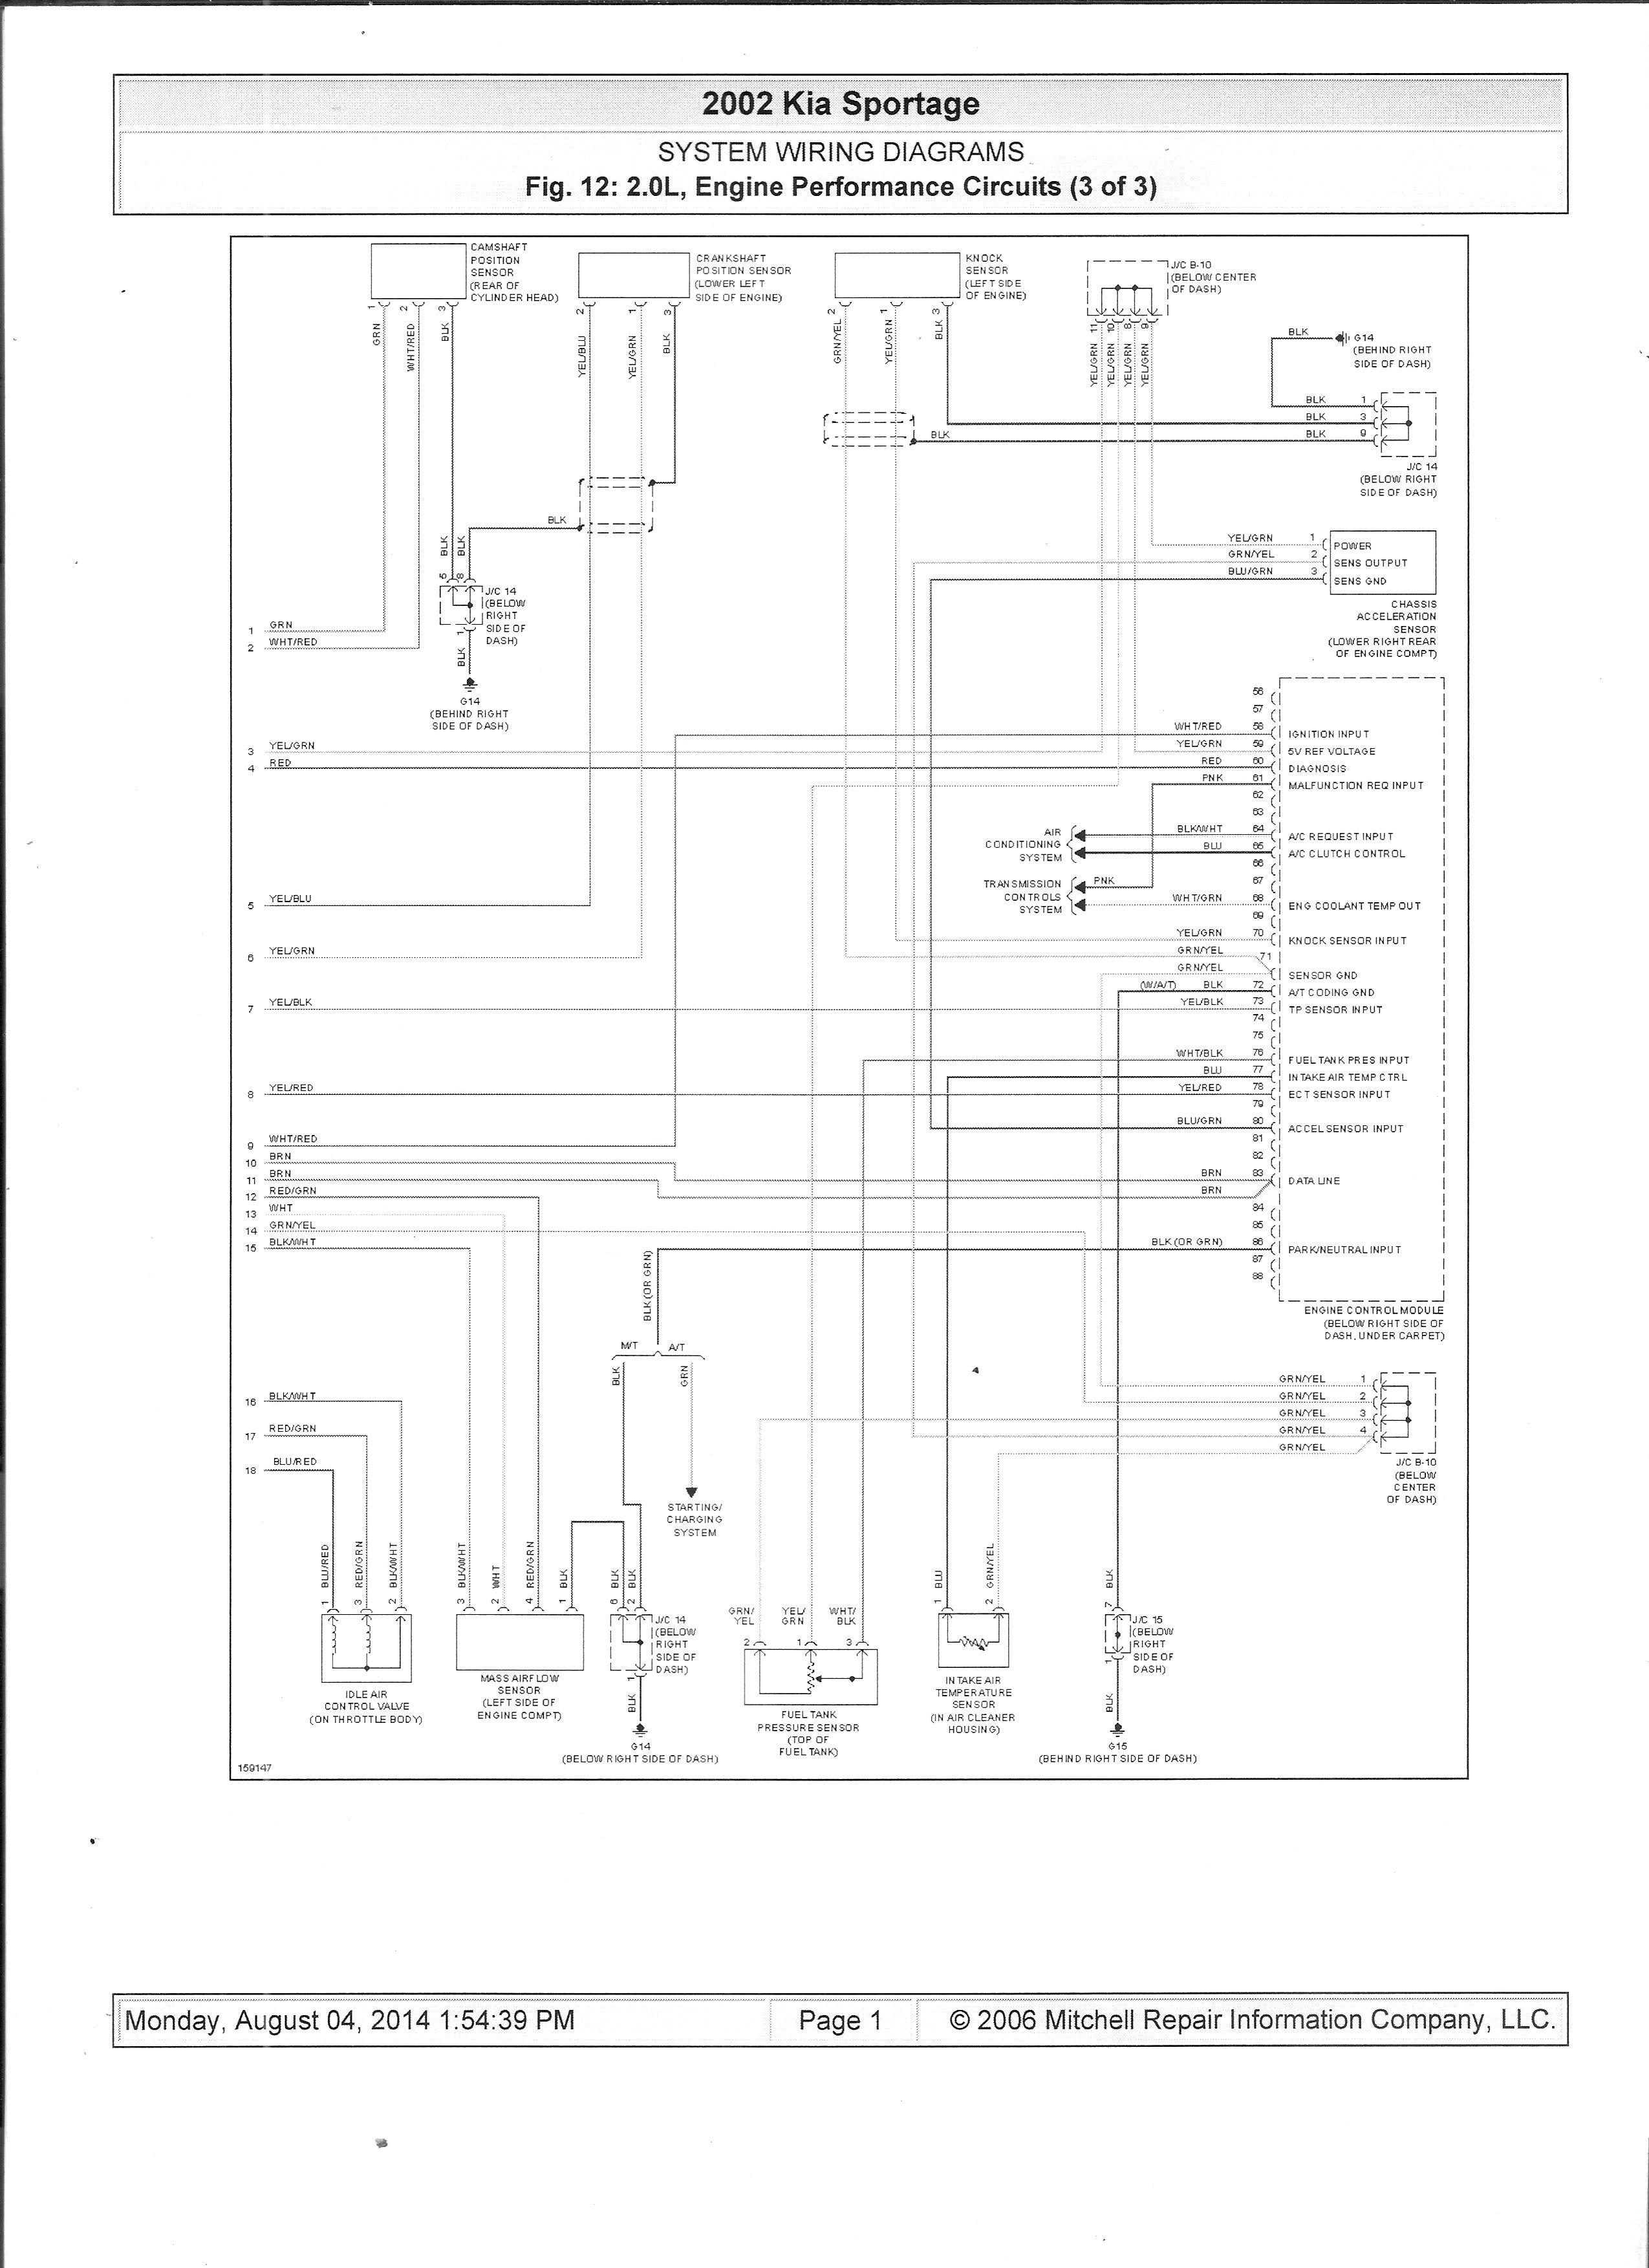 I Am Working On A 2002 Kia Sportage No Start  I Have No